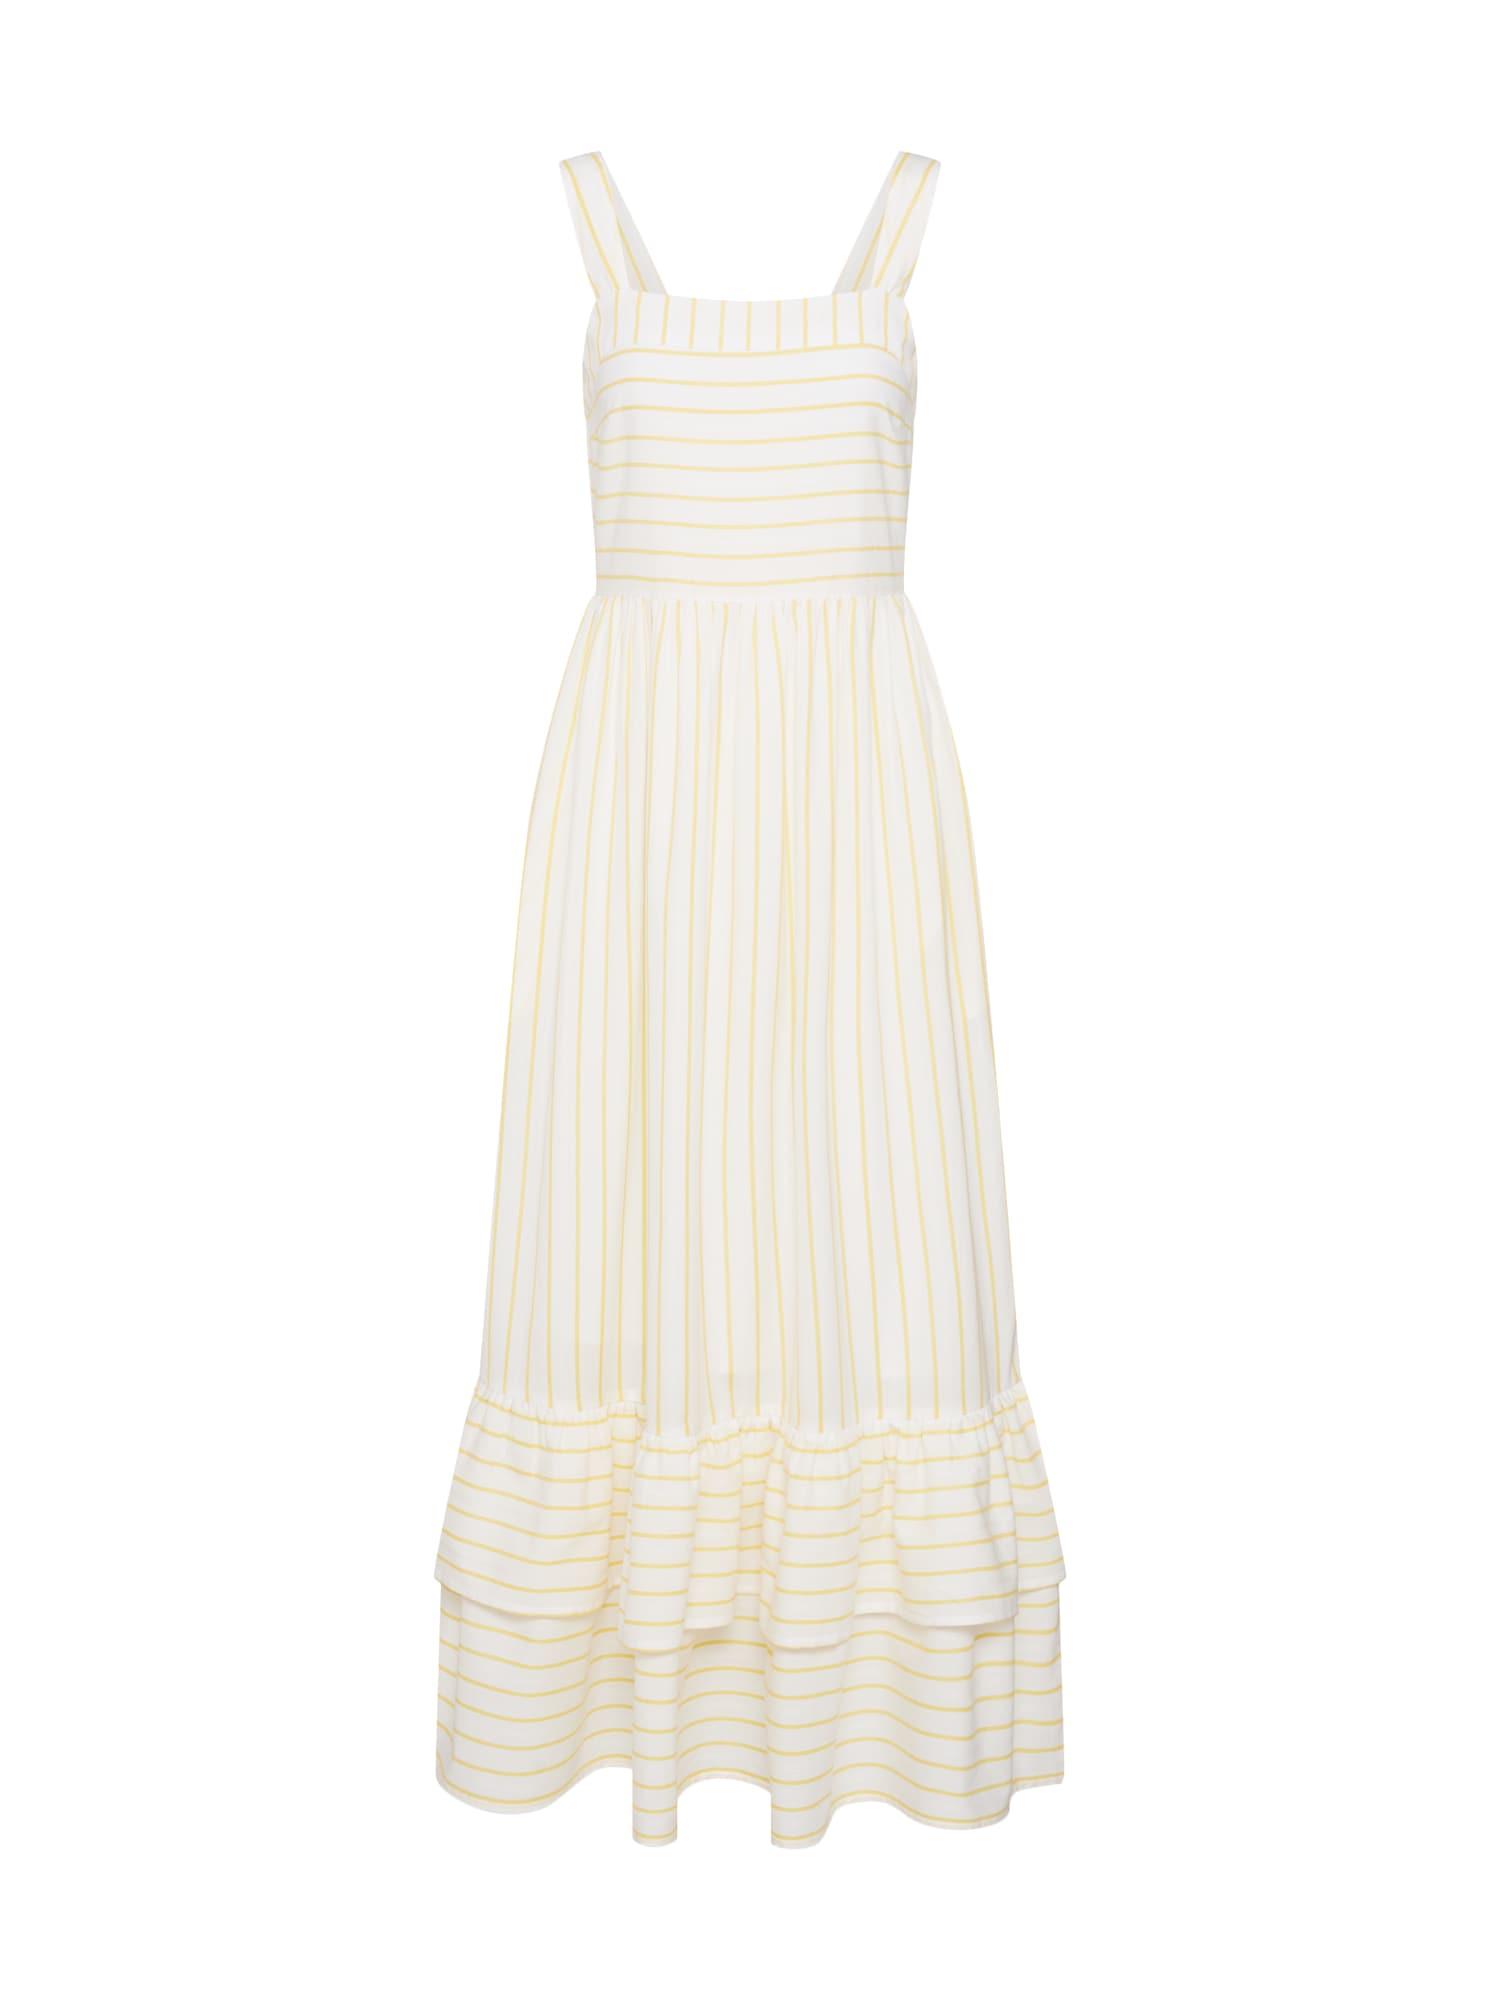 Letní šaty FINA žlutá bílá Y.A.S